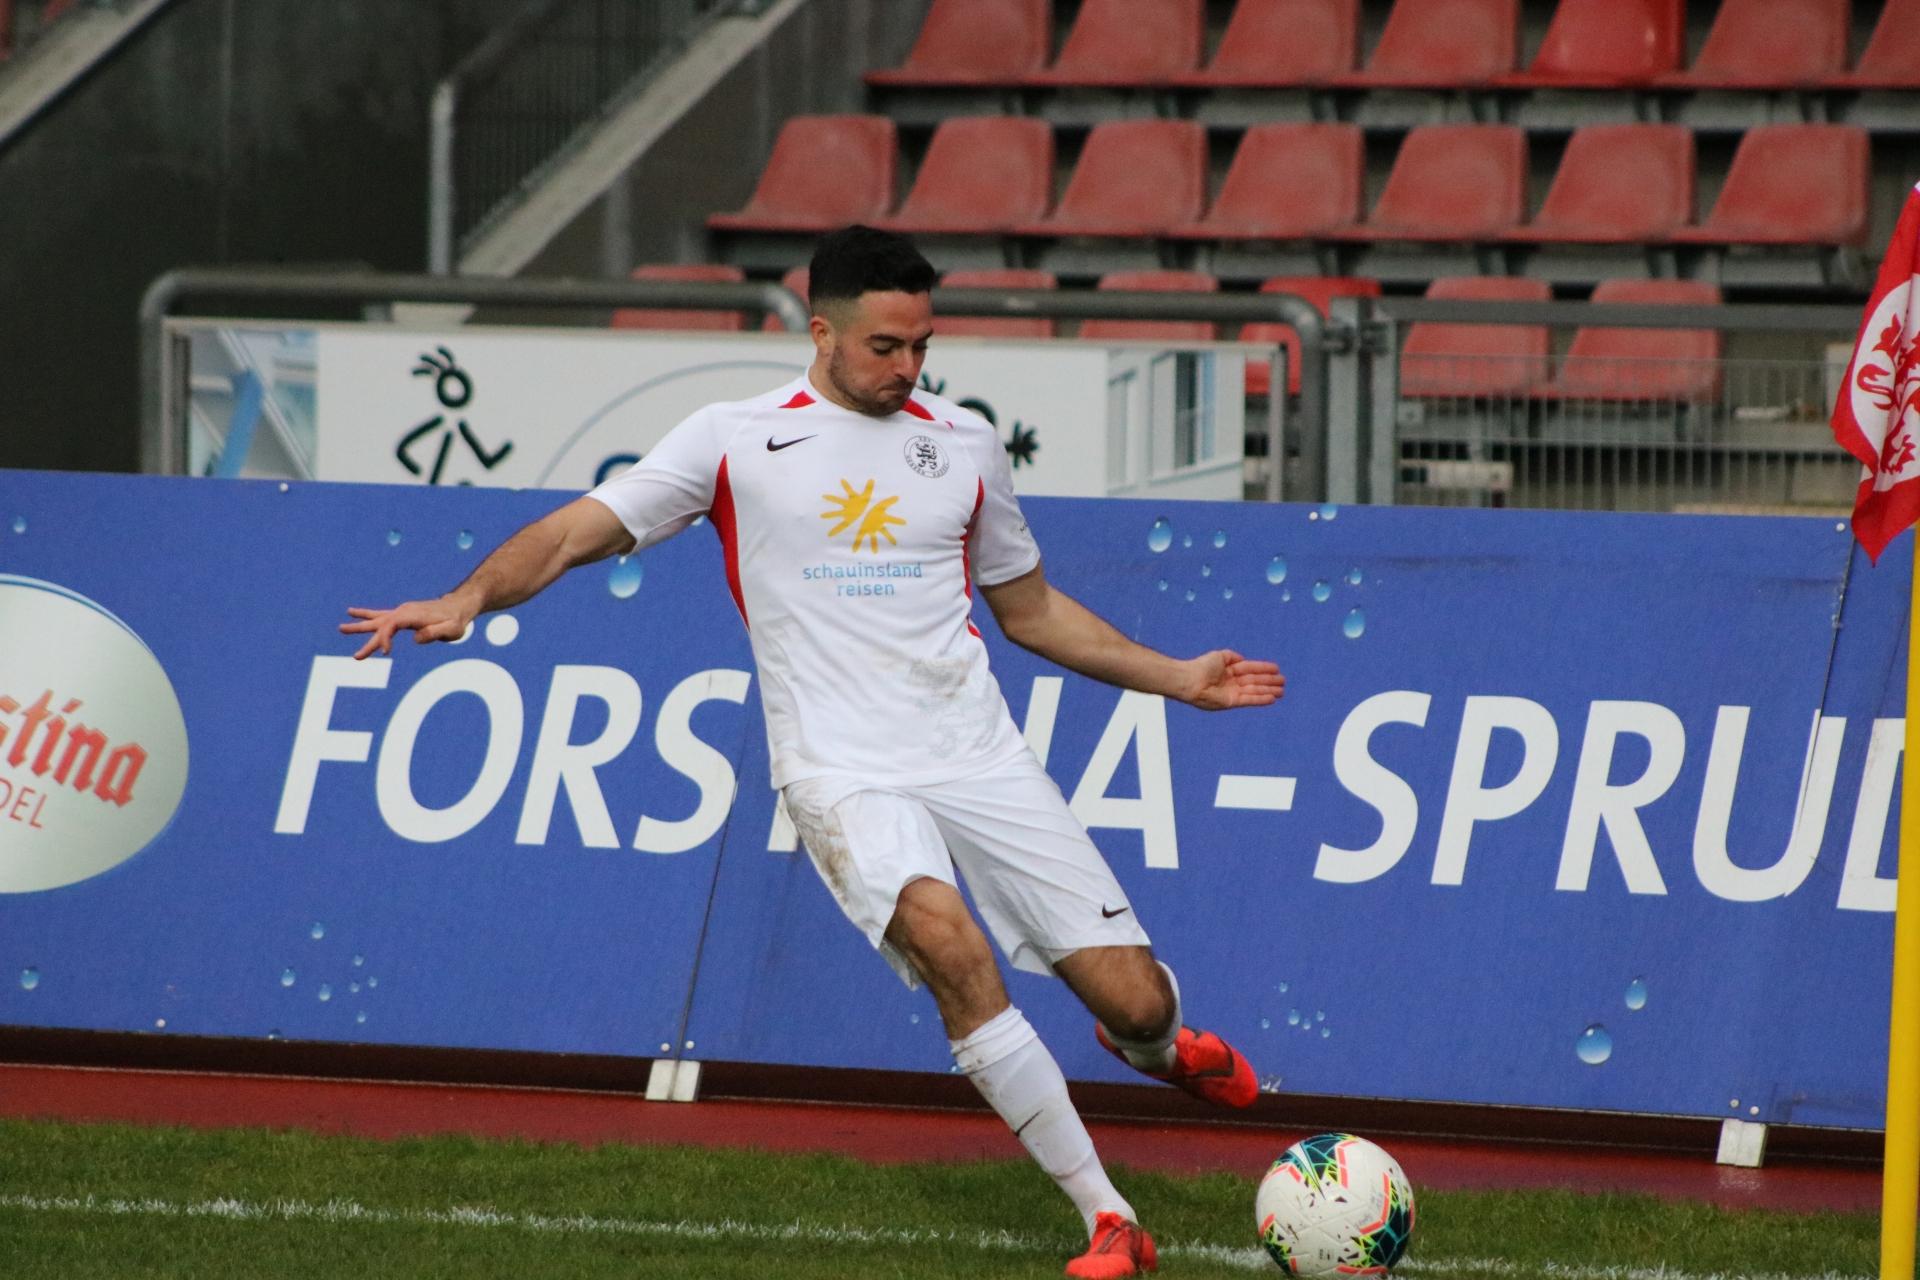 Lotto Hessenliga 2019/2020, KSV Hessen Kassel, FV Bad Vilbel, Endstand 6:1, Adrian Bravo Sanchez (KSV Hessen Kassel)